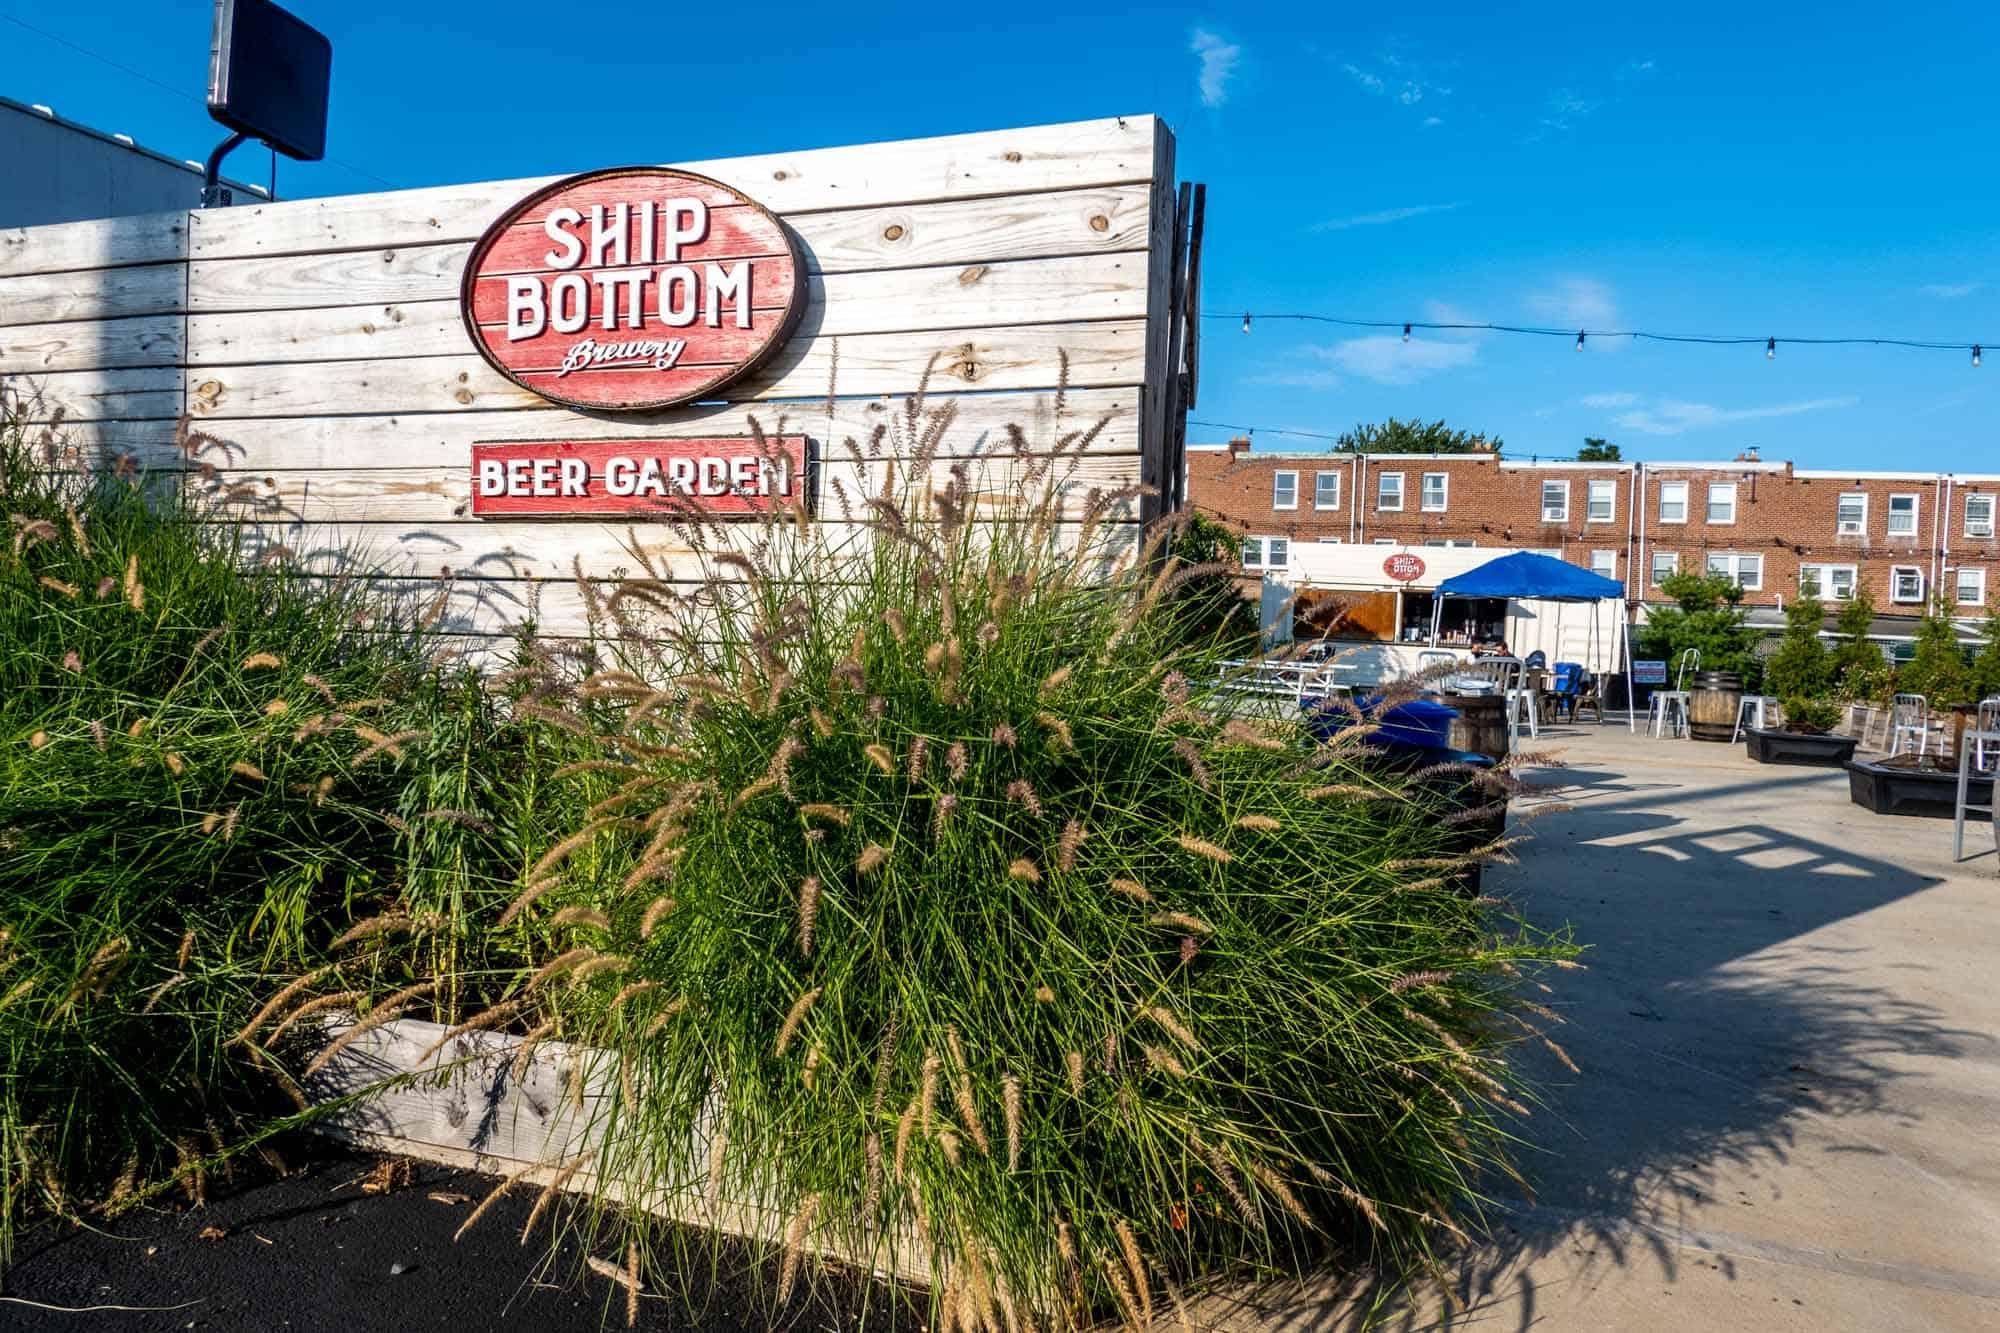 Entrance to outdoor beer garden